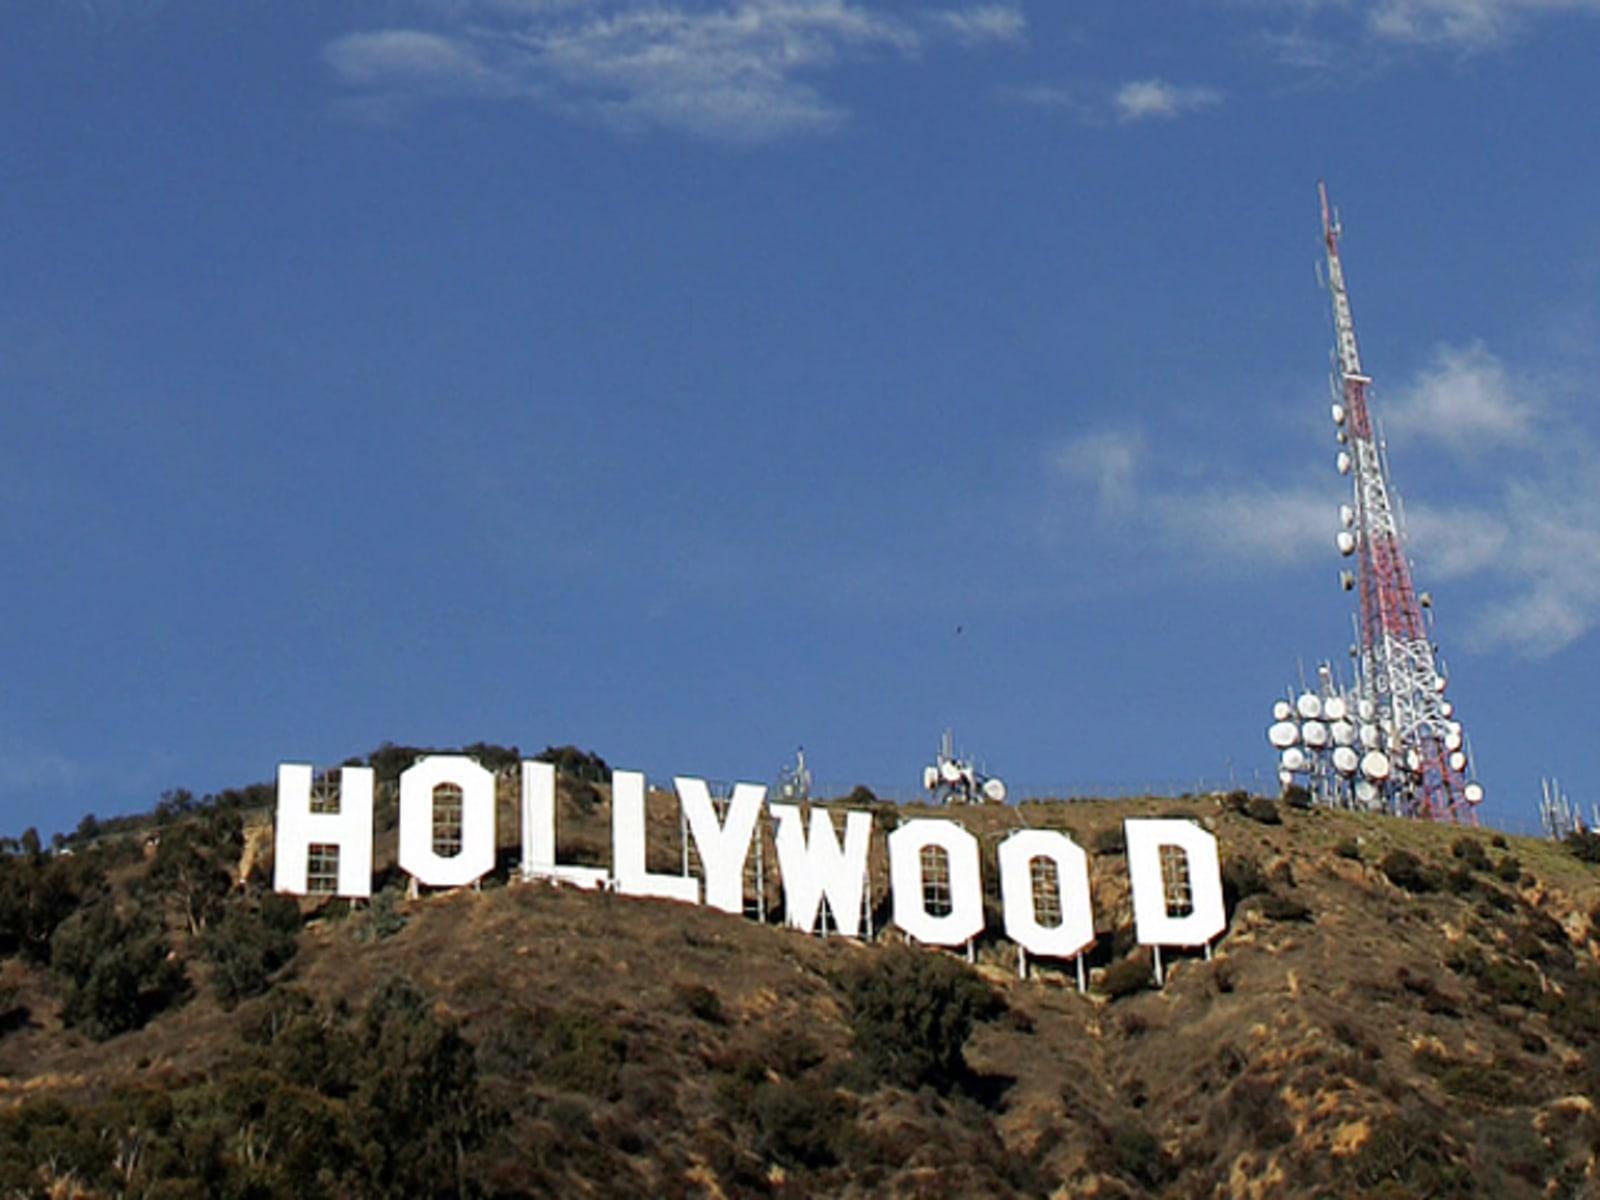 Image: Hollywood Sign Repainting Project Completed With LA Mayor Antonio Villaraigosa